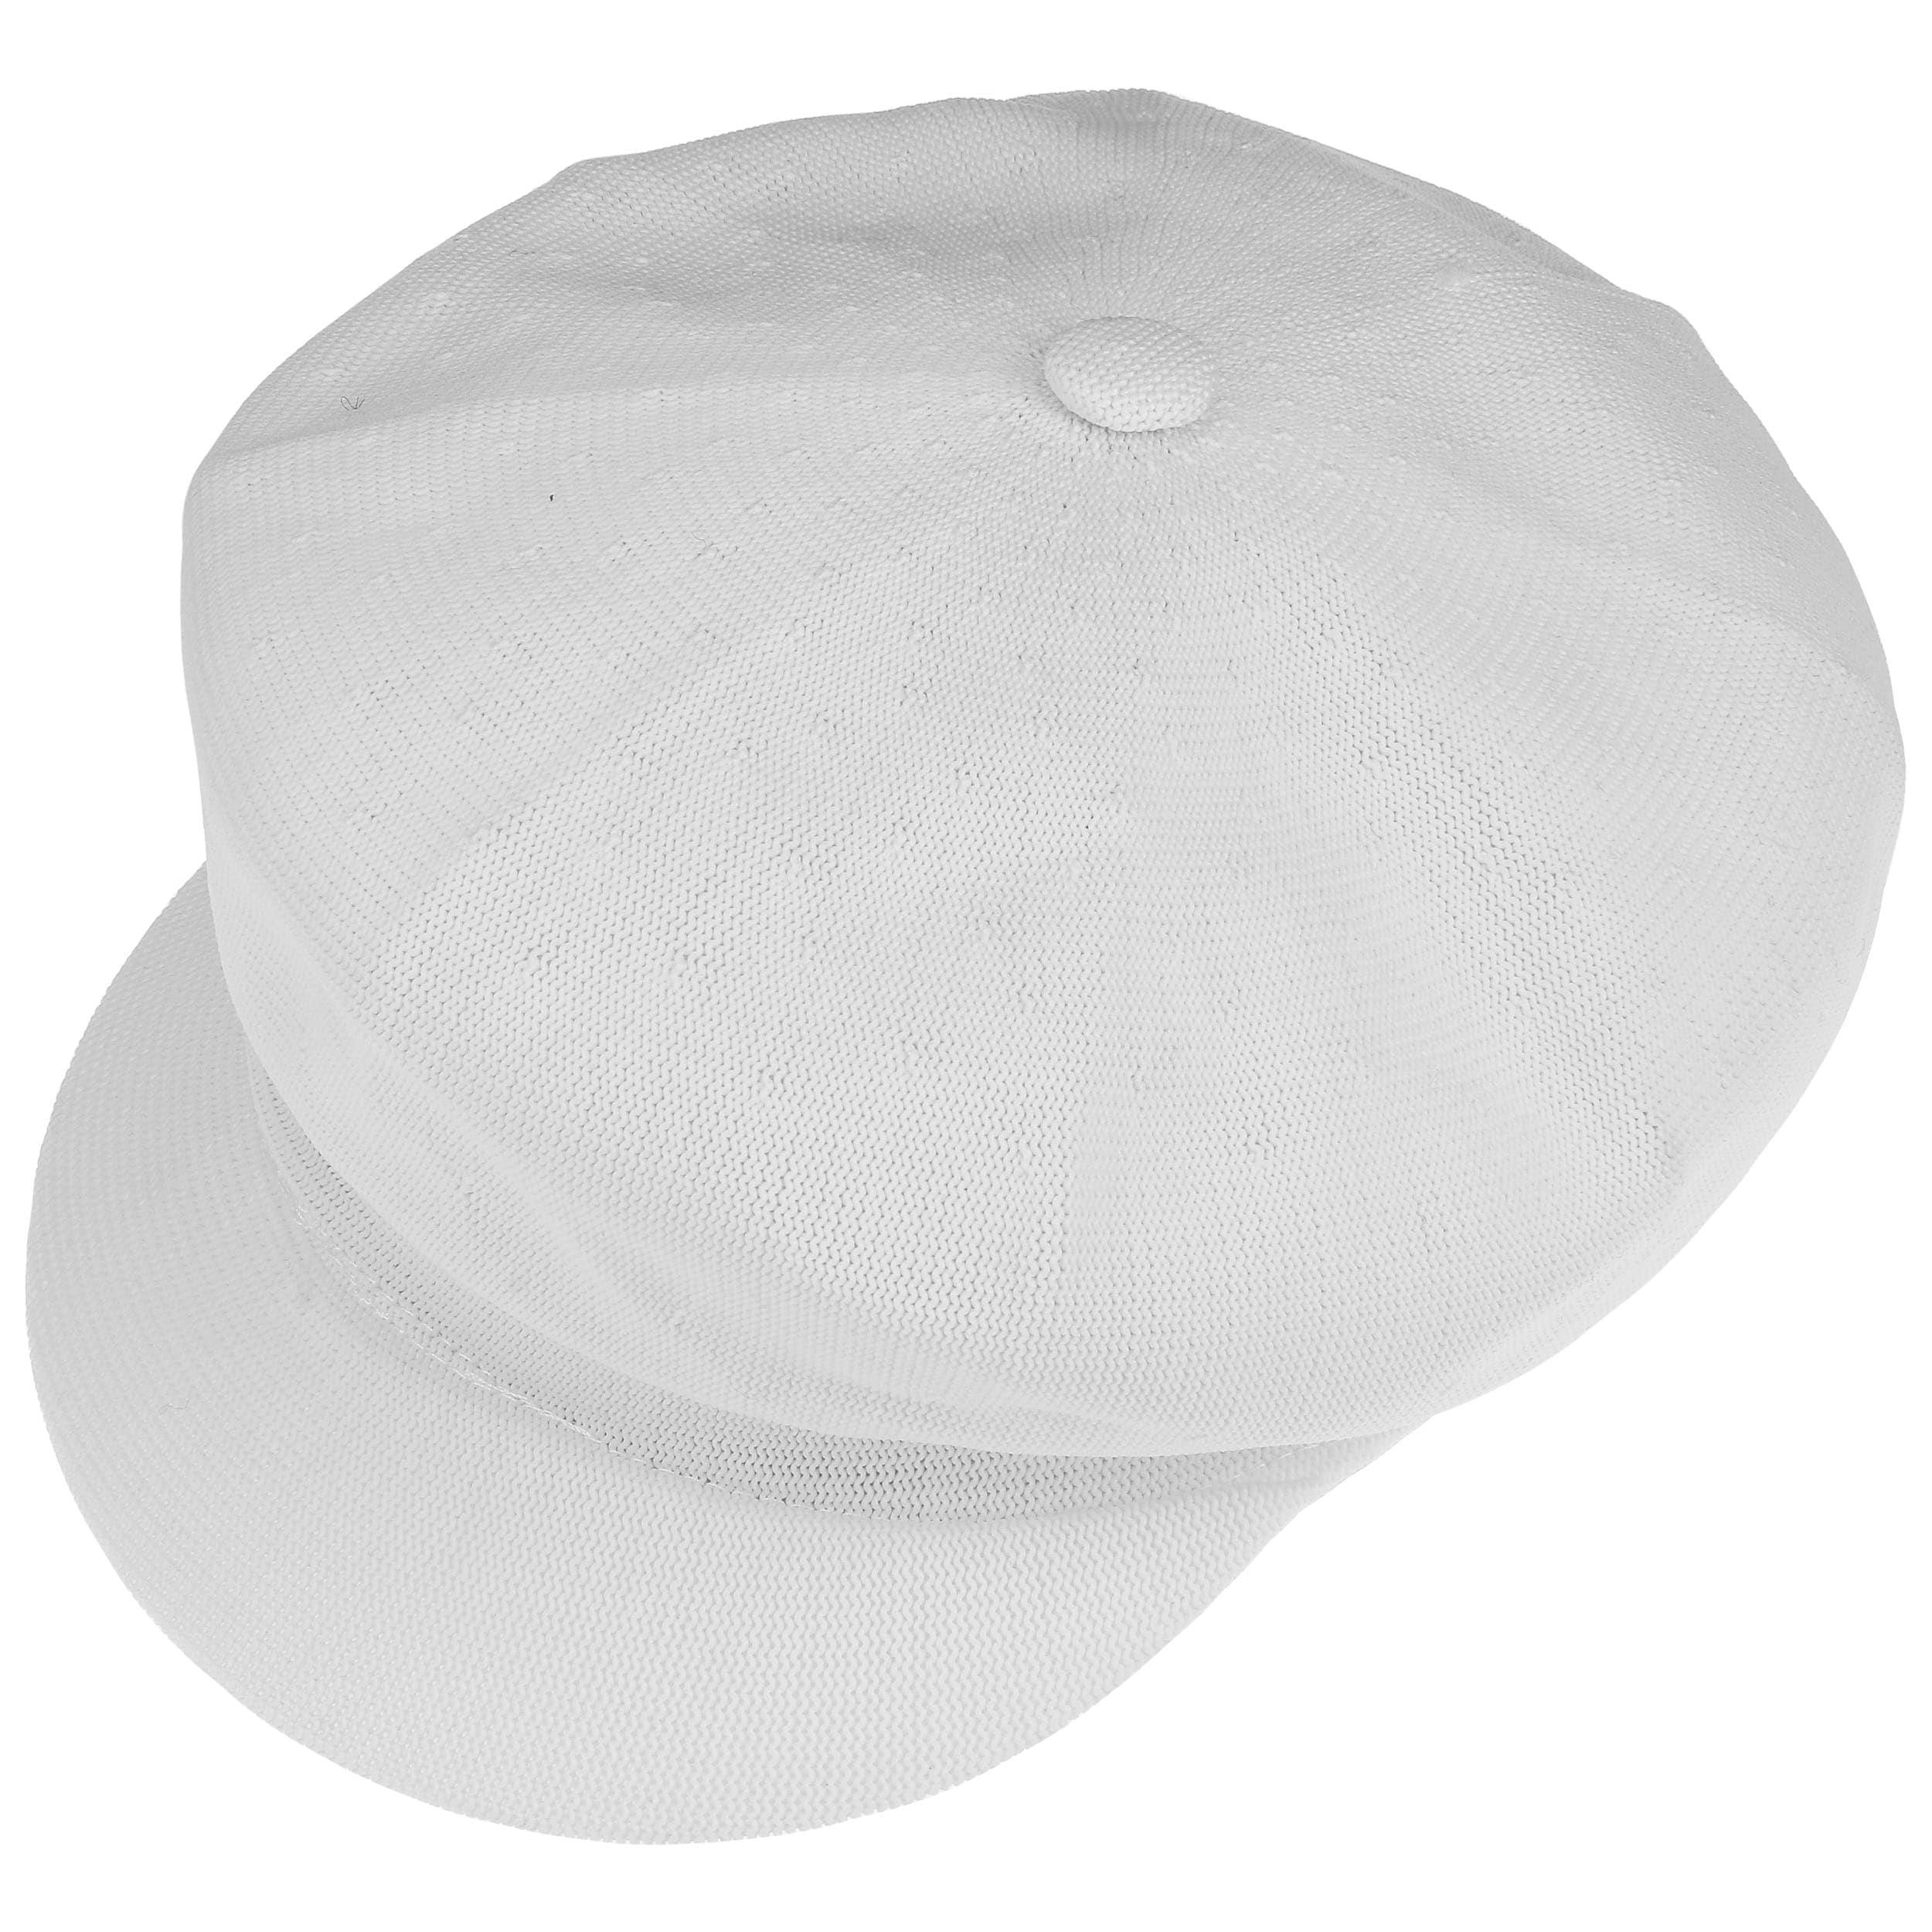 1504bc04328 ... Kangol Tropic Spitfire Newsboy Cap - white 1 ...